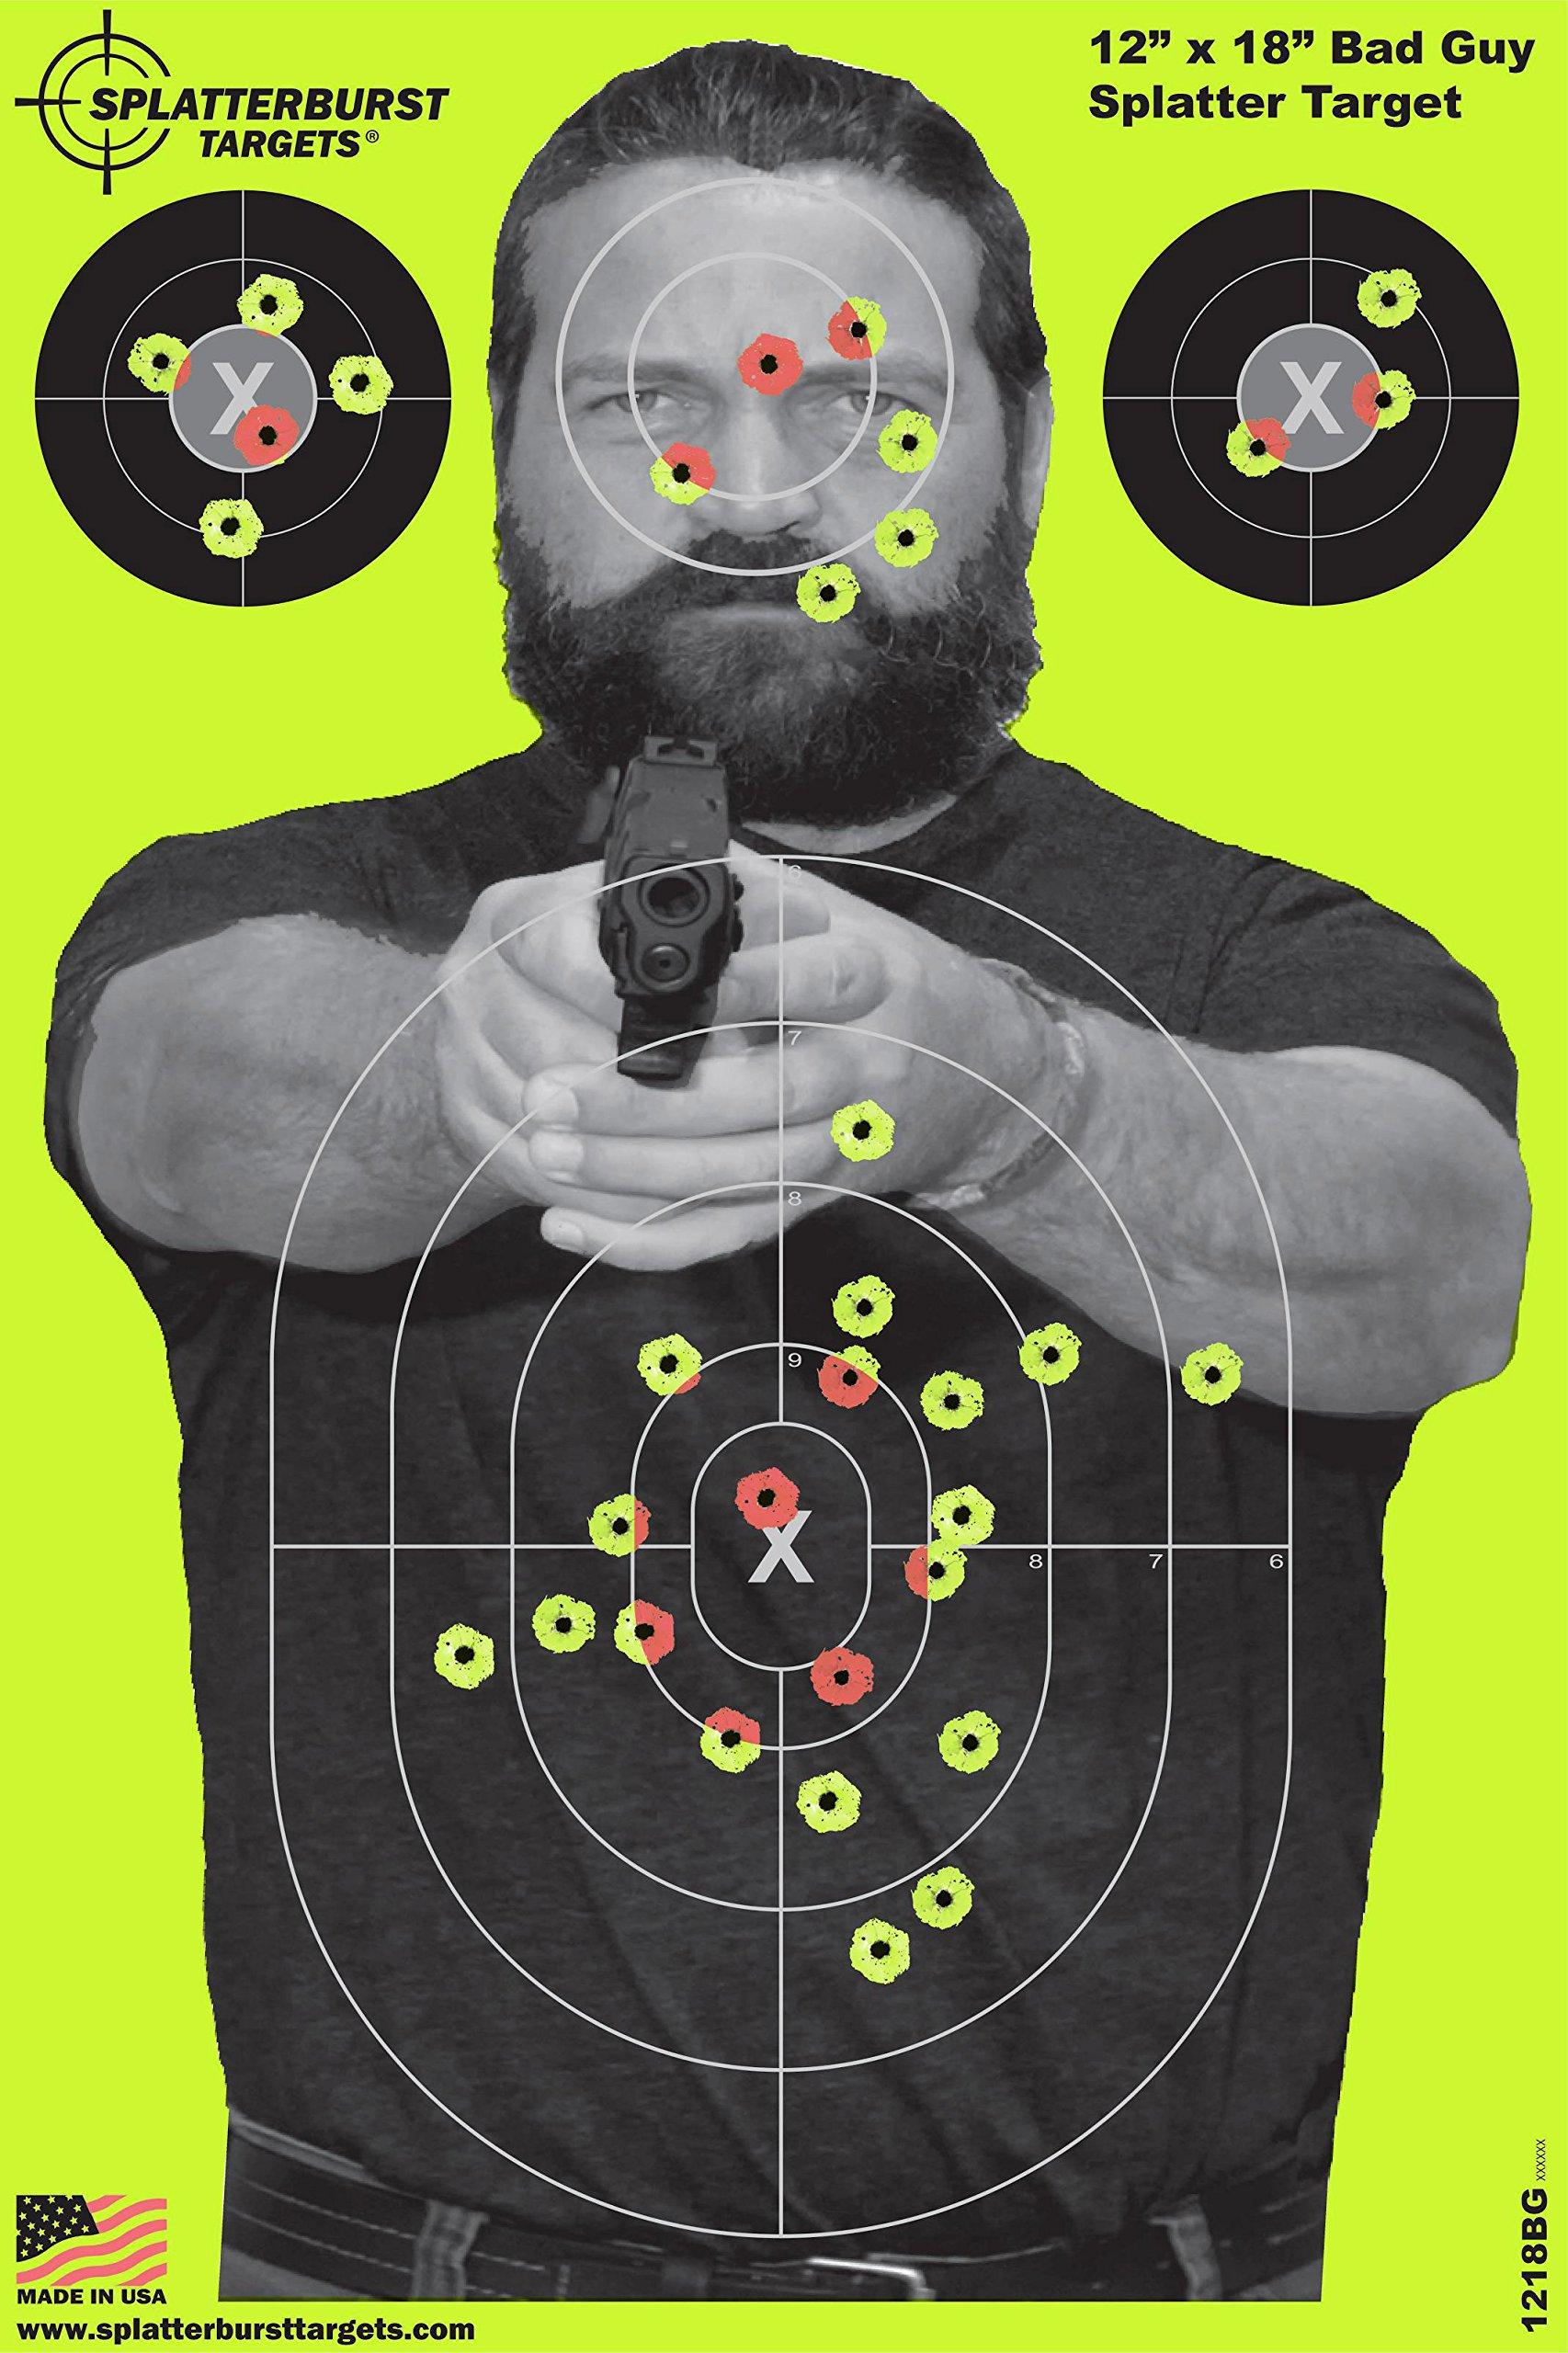 Splatterburst Targets - 12 x18 inch - Bad Guy Reactive Shooting Target - Shots Burst Bright Fluorescent Yellow Upon Impact - Gun - Rifle - Pistol - Airsoft - BB Gun - Air Rifle (10 Pack)